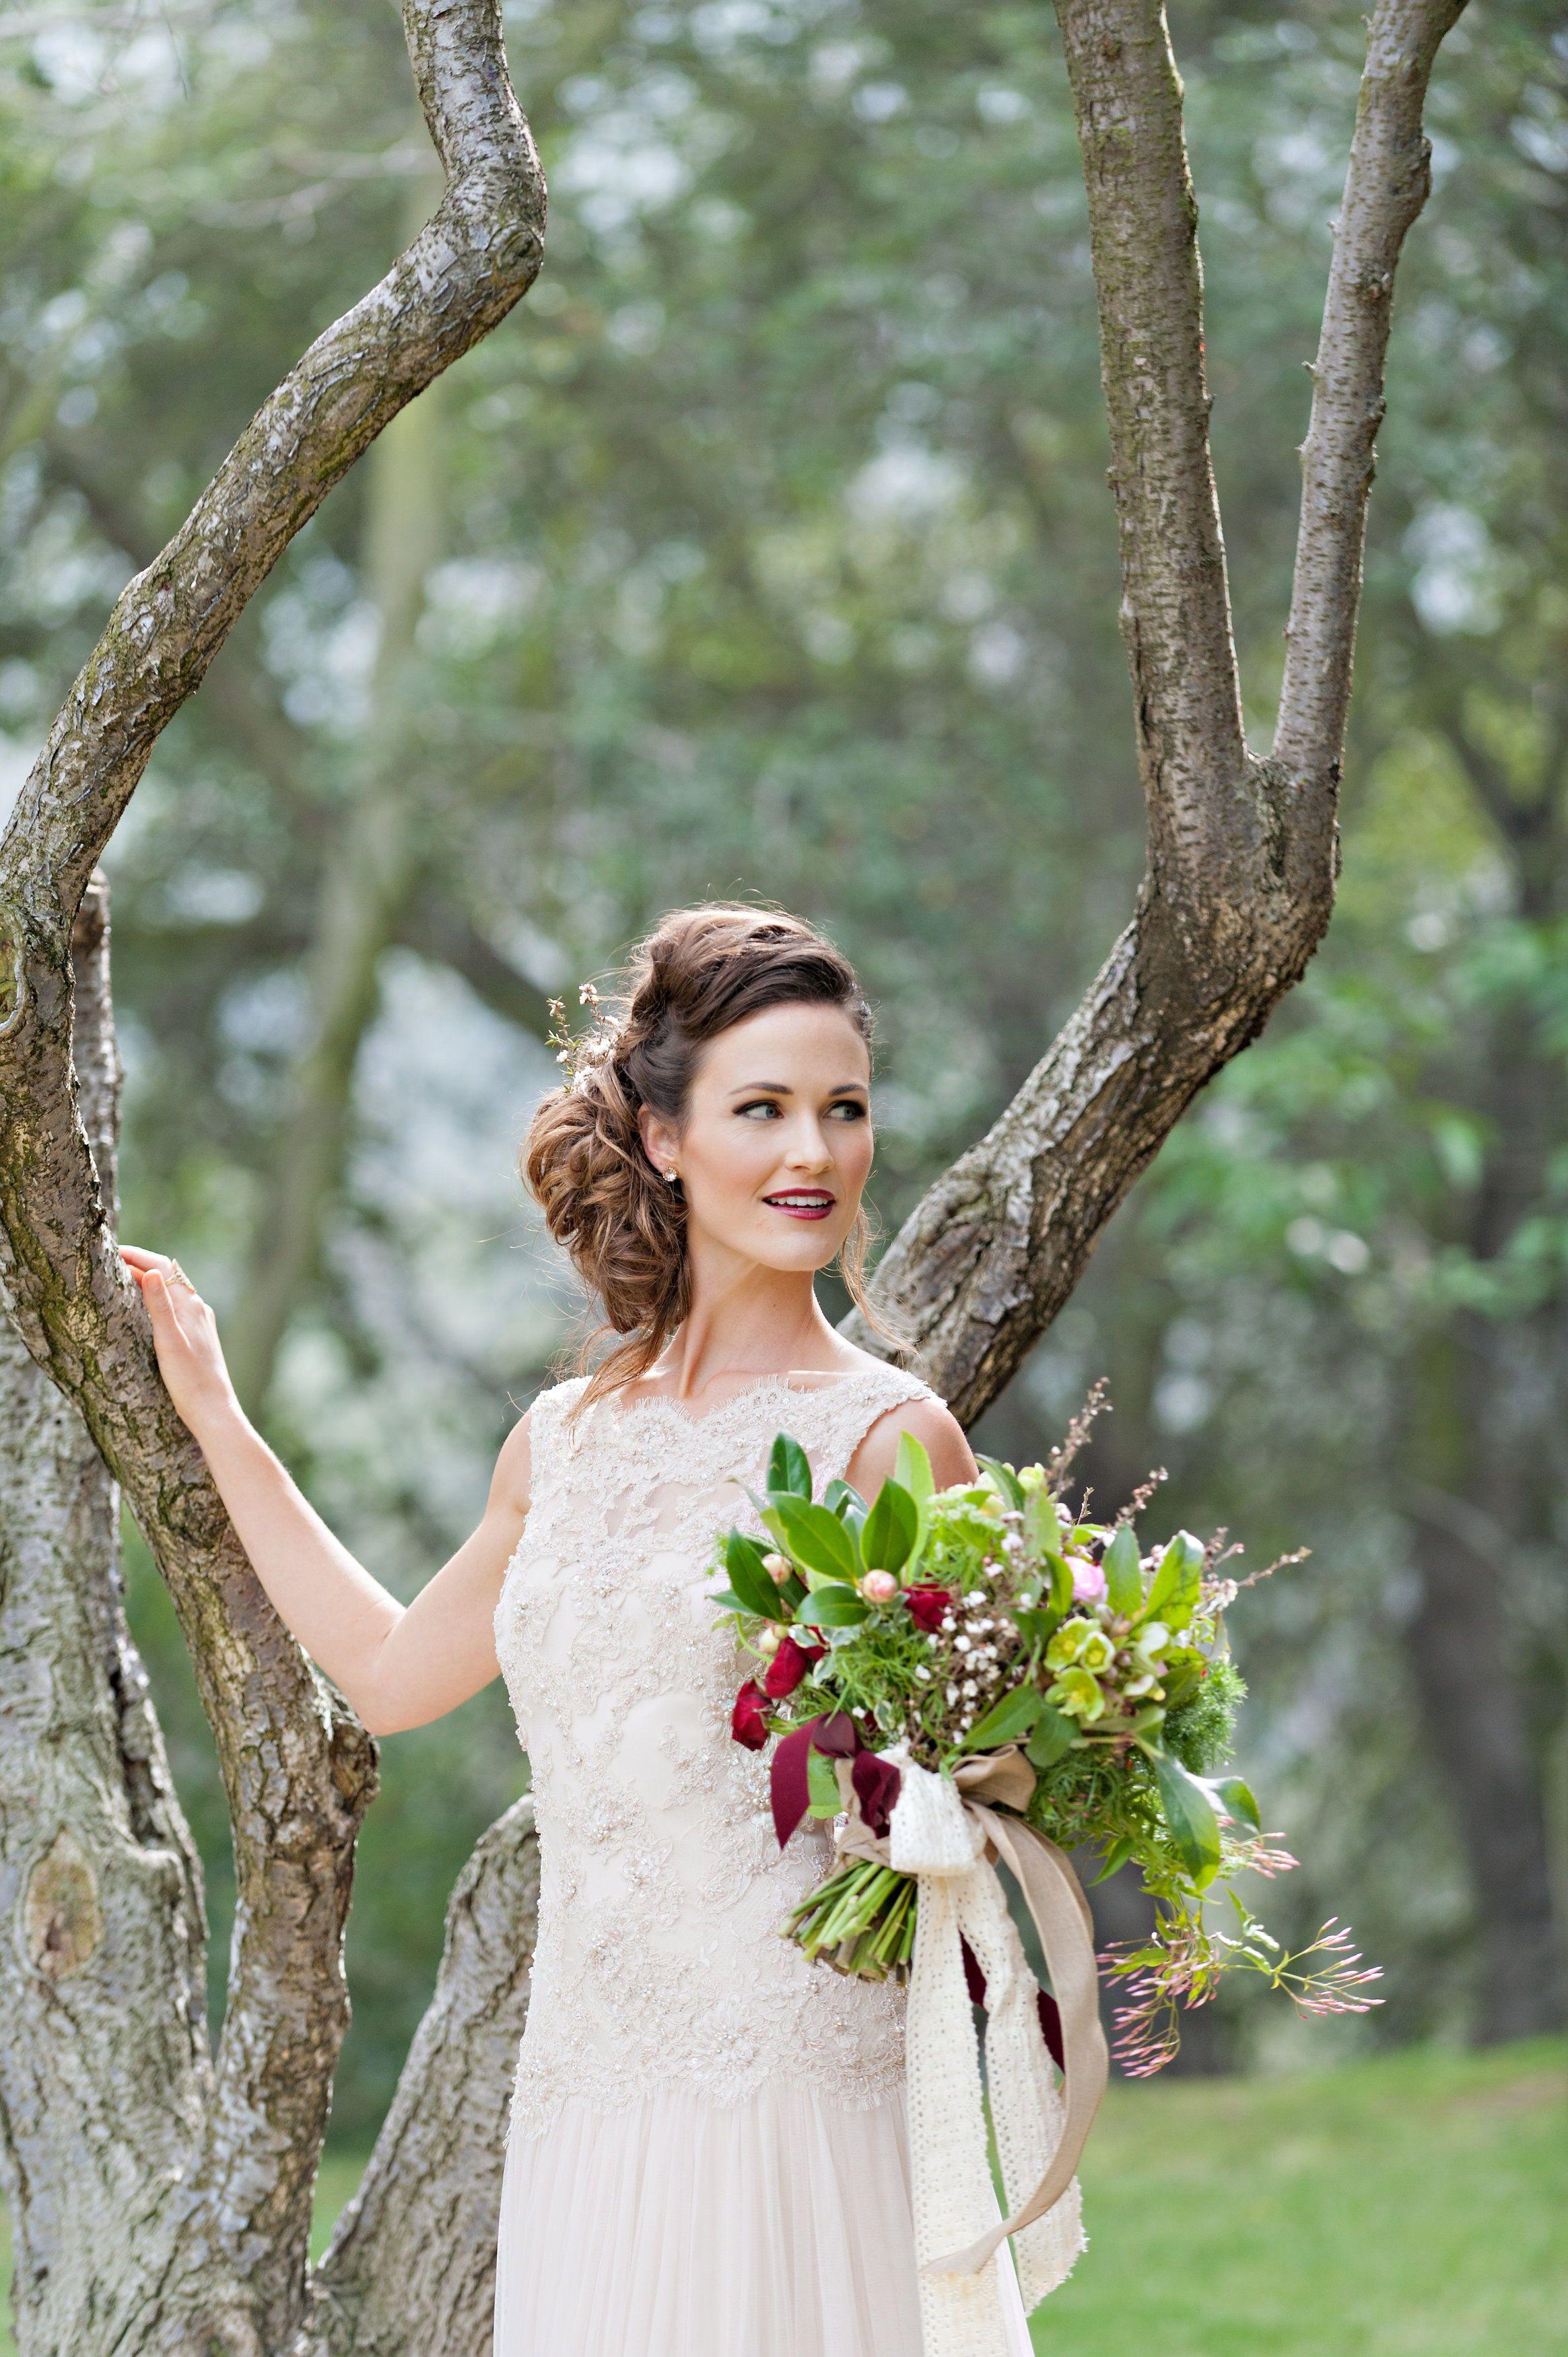 15+ Rose wedding dress downton abbey ideas